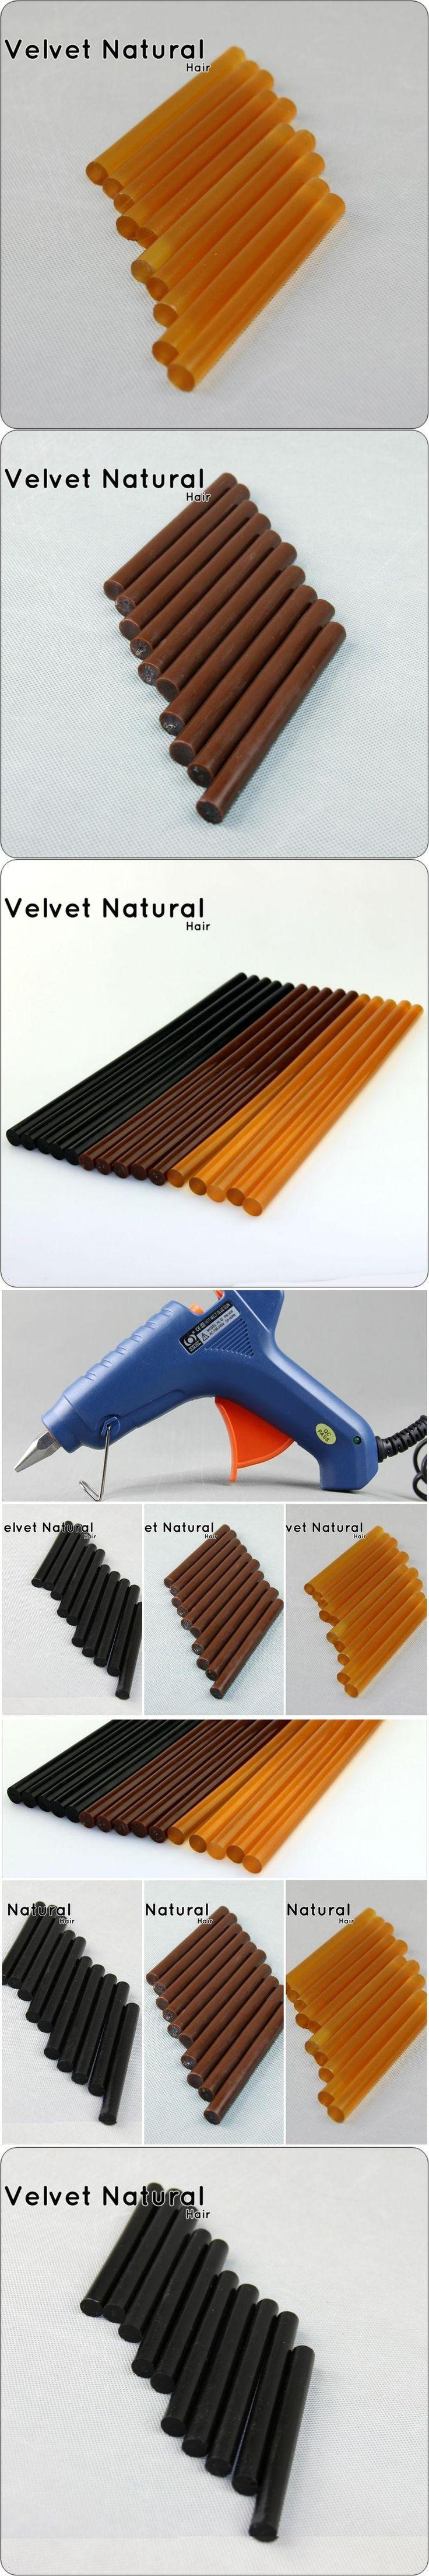 Keratin Glue Sticks 5pc/pack Hot Melt Glue Sticks 120*11mm Professional Hair Tools 3 Colors For Fusion Keratin Hair Extensions